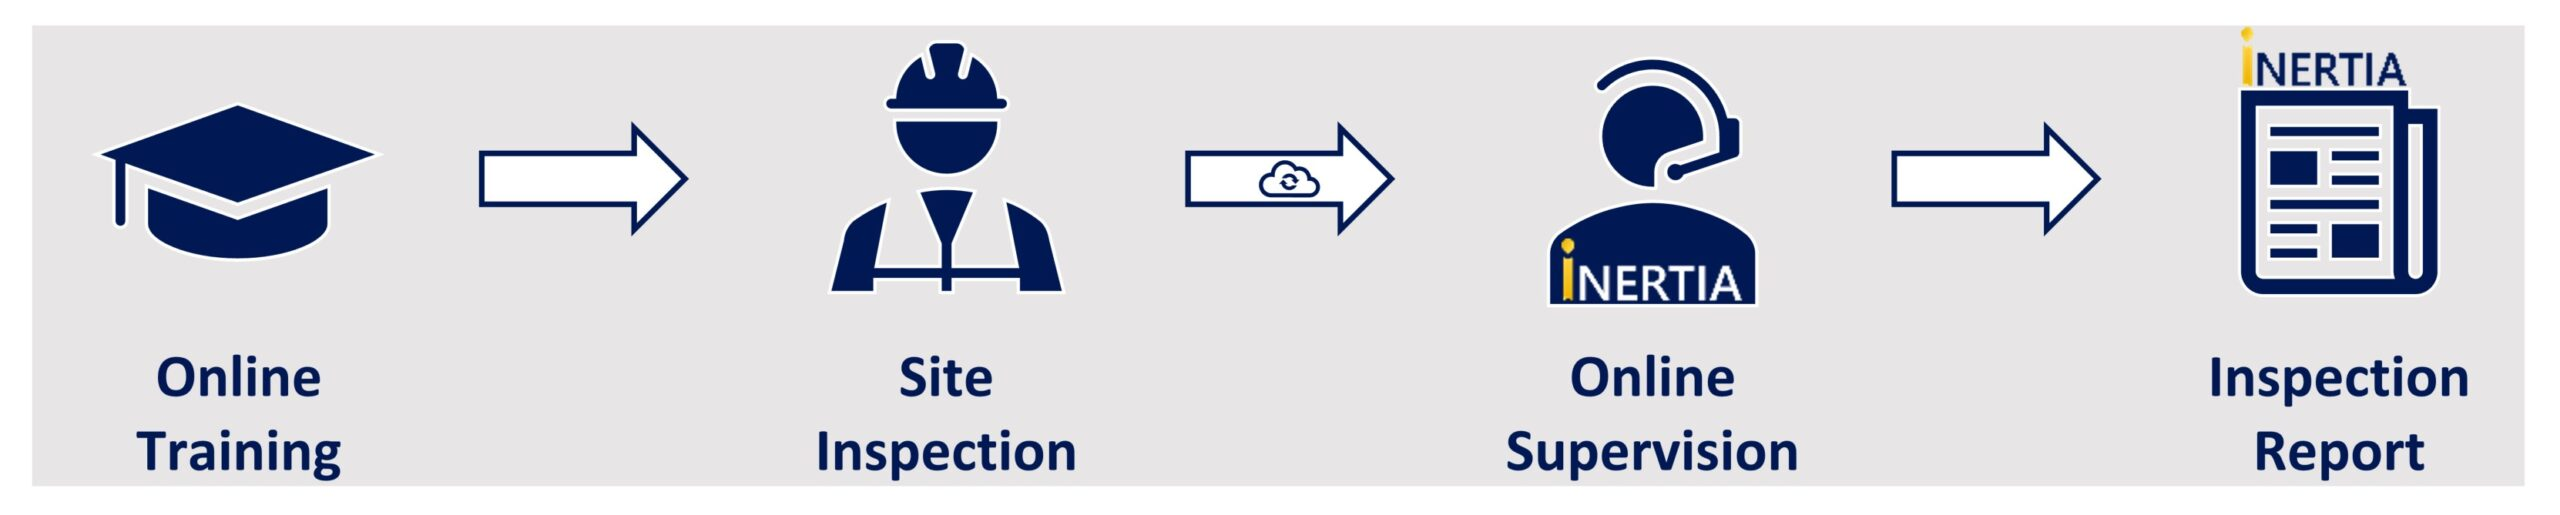 SRF diagram